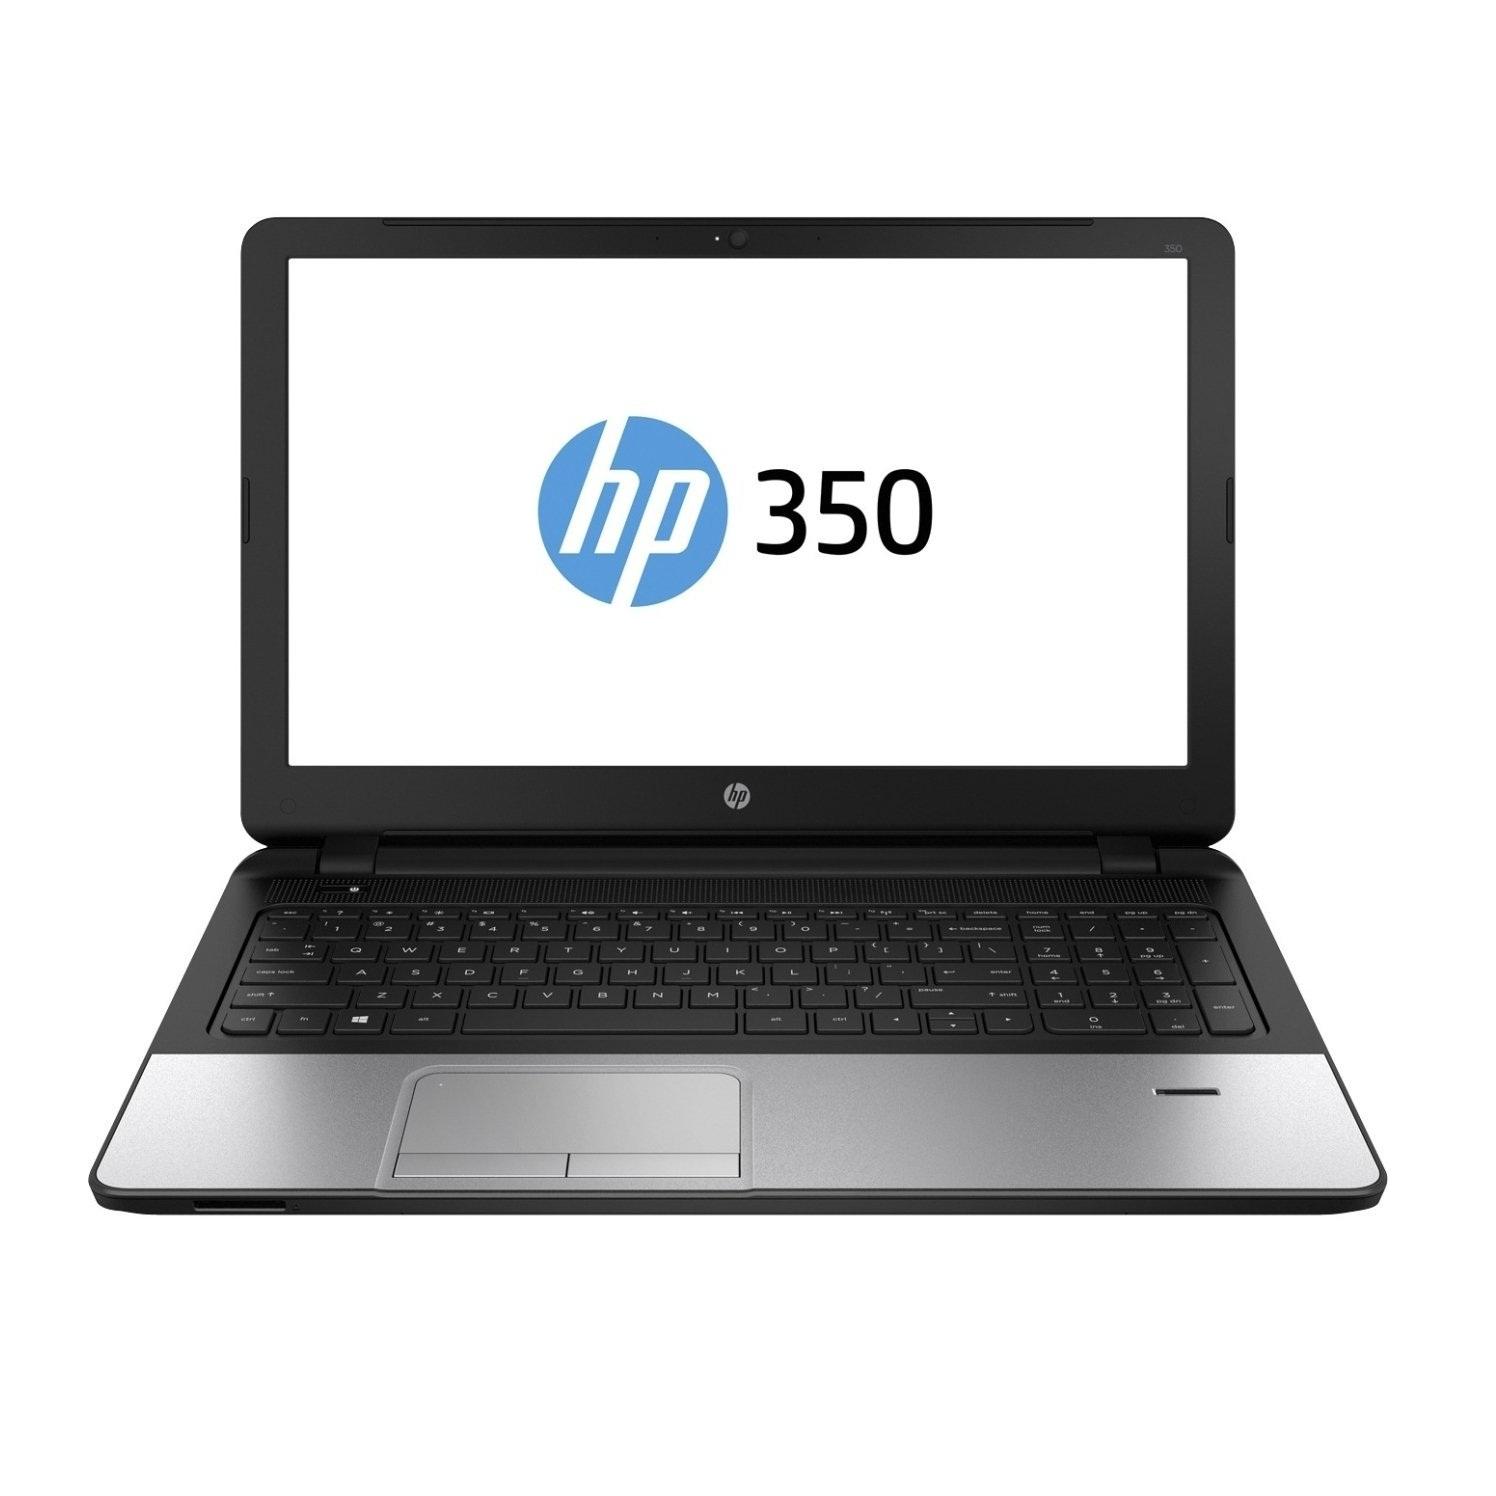 HP 350/Core i3-4005U (White)